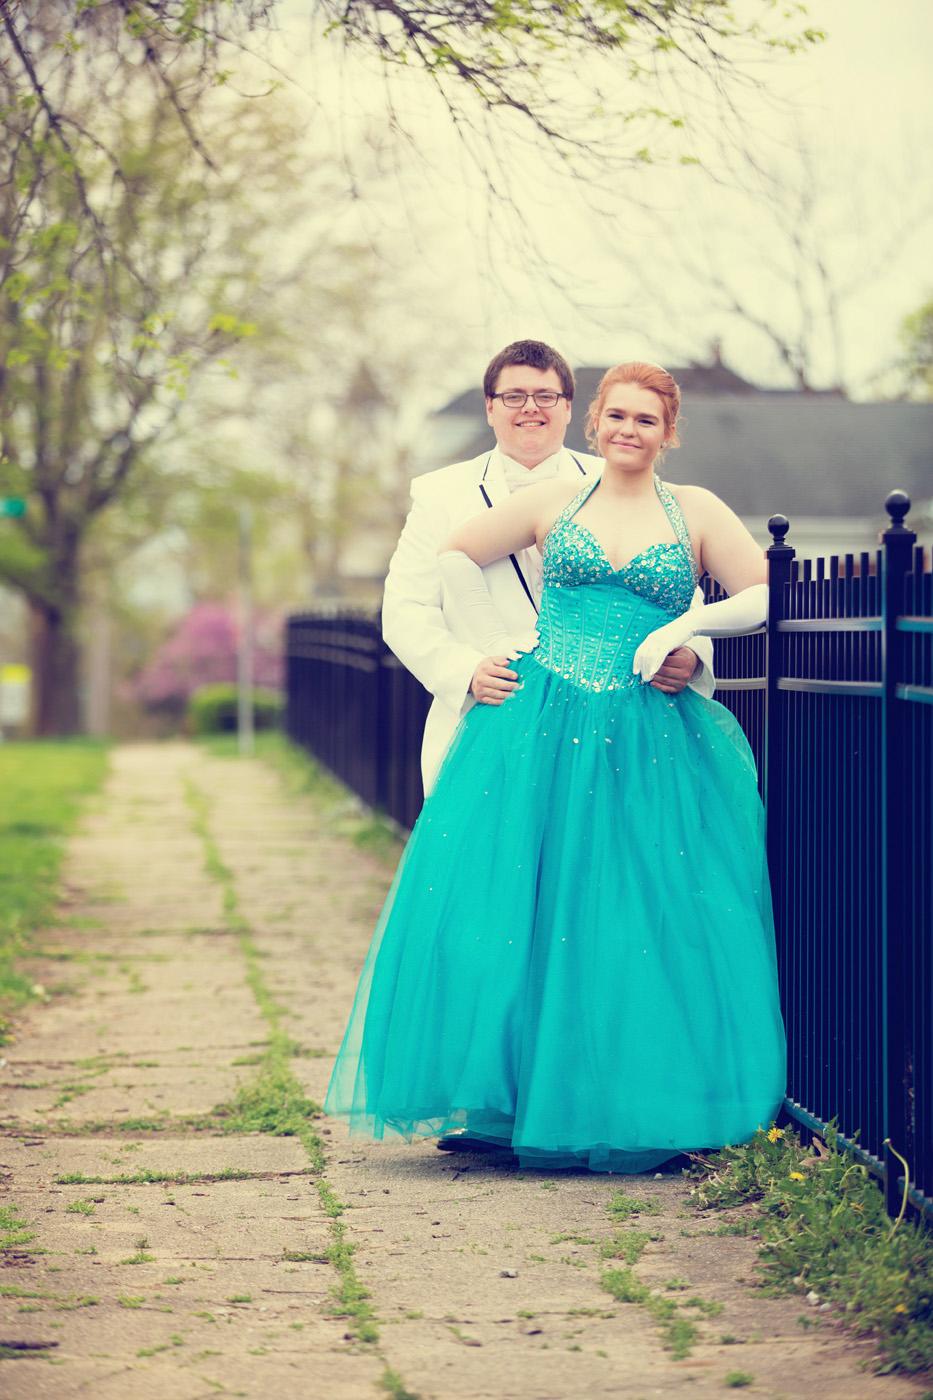 Garrett & Helen Prom 2014 115_1.jpg